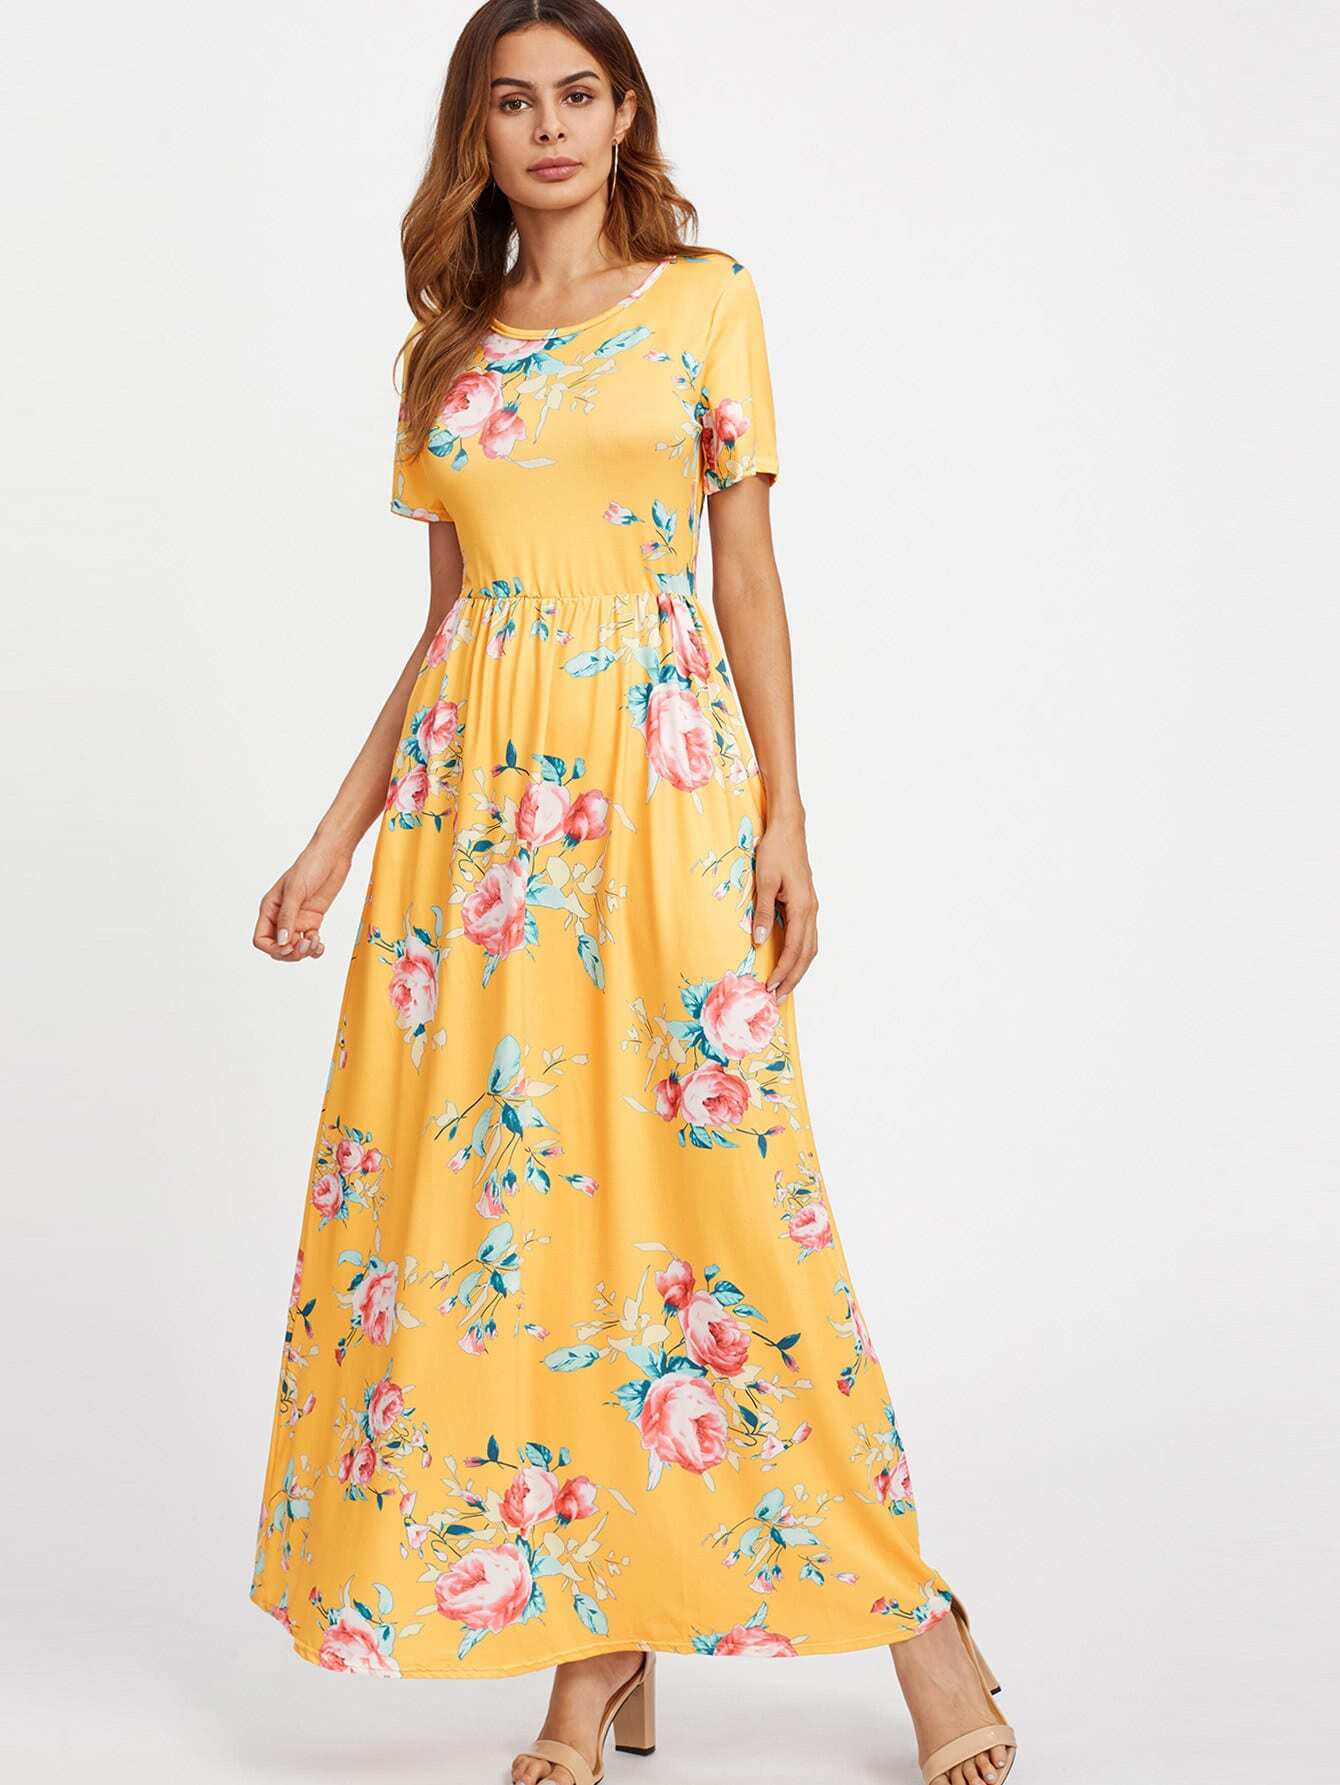 All Over Florals Full Length Dress all over florals hanky hem dress